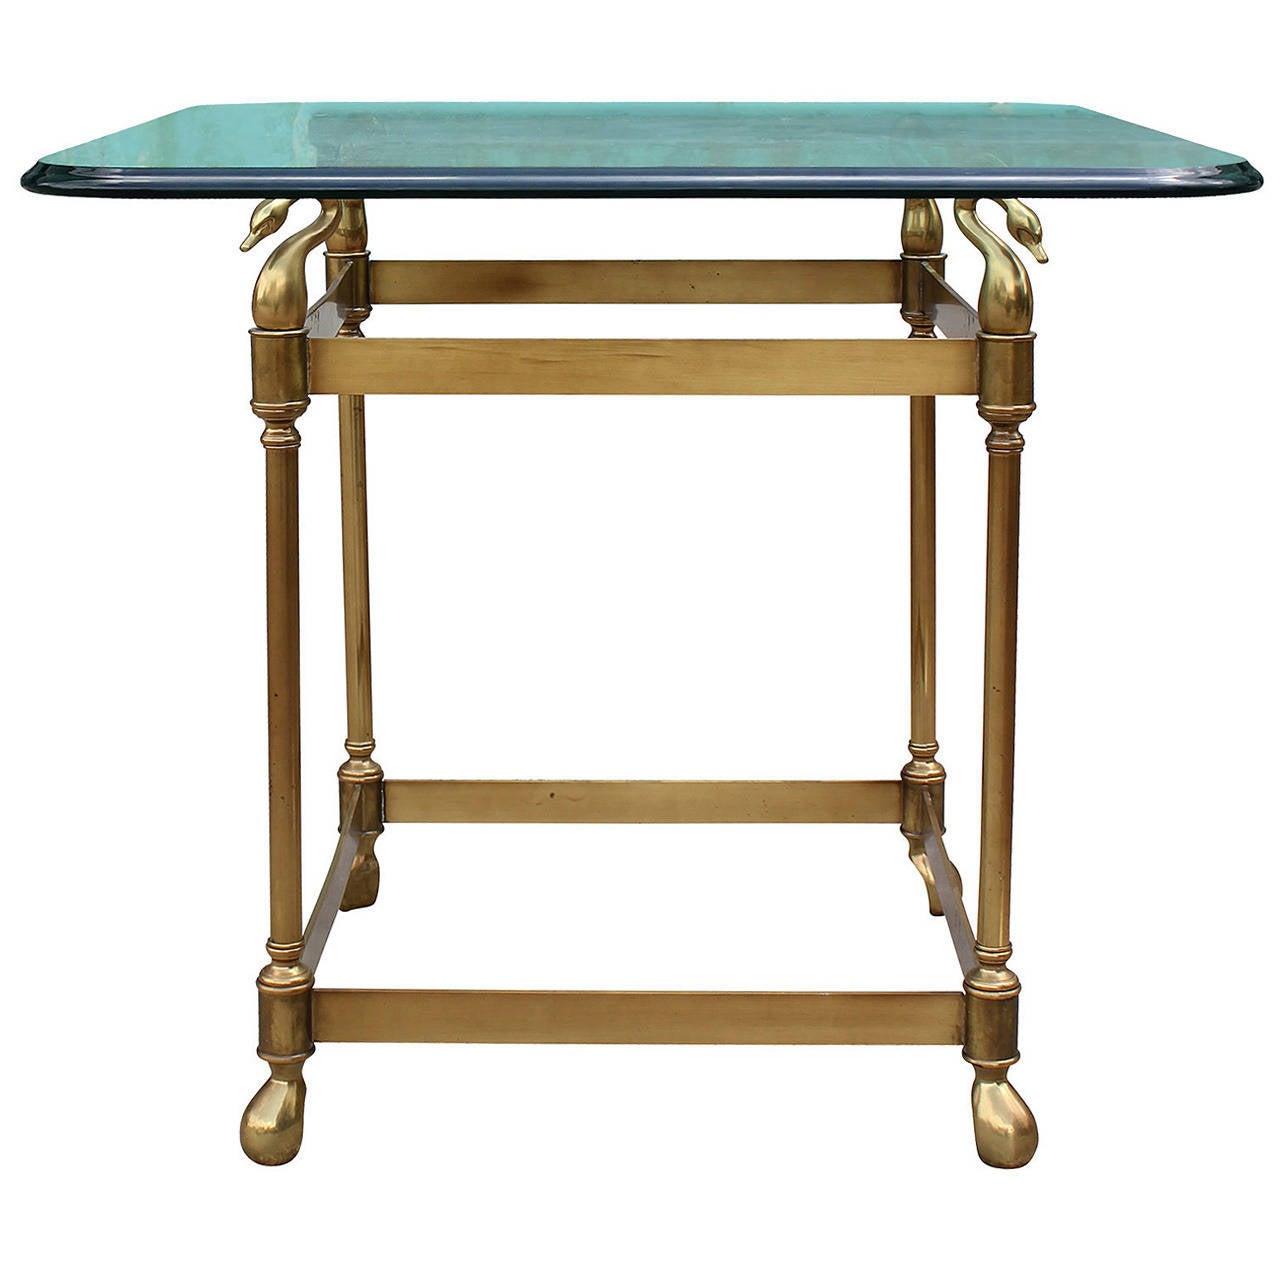 Fabulous Hollywood Regency Swan Motif Brass Gueridon or Occasional Table